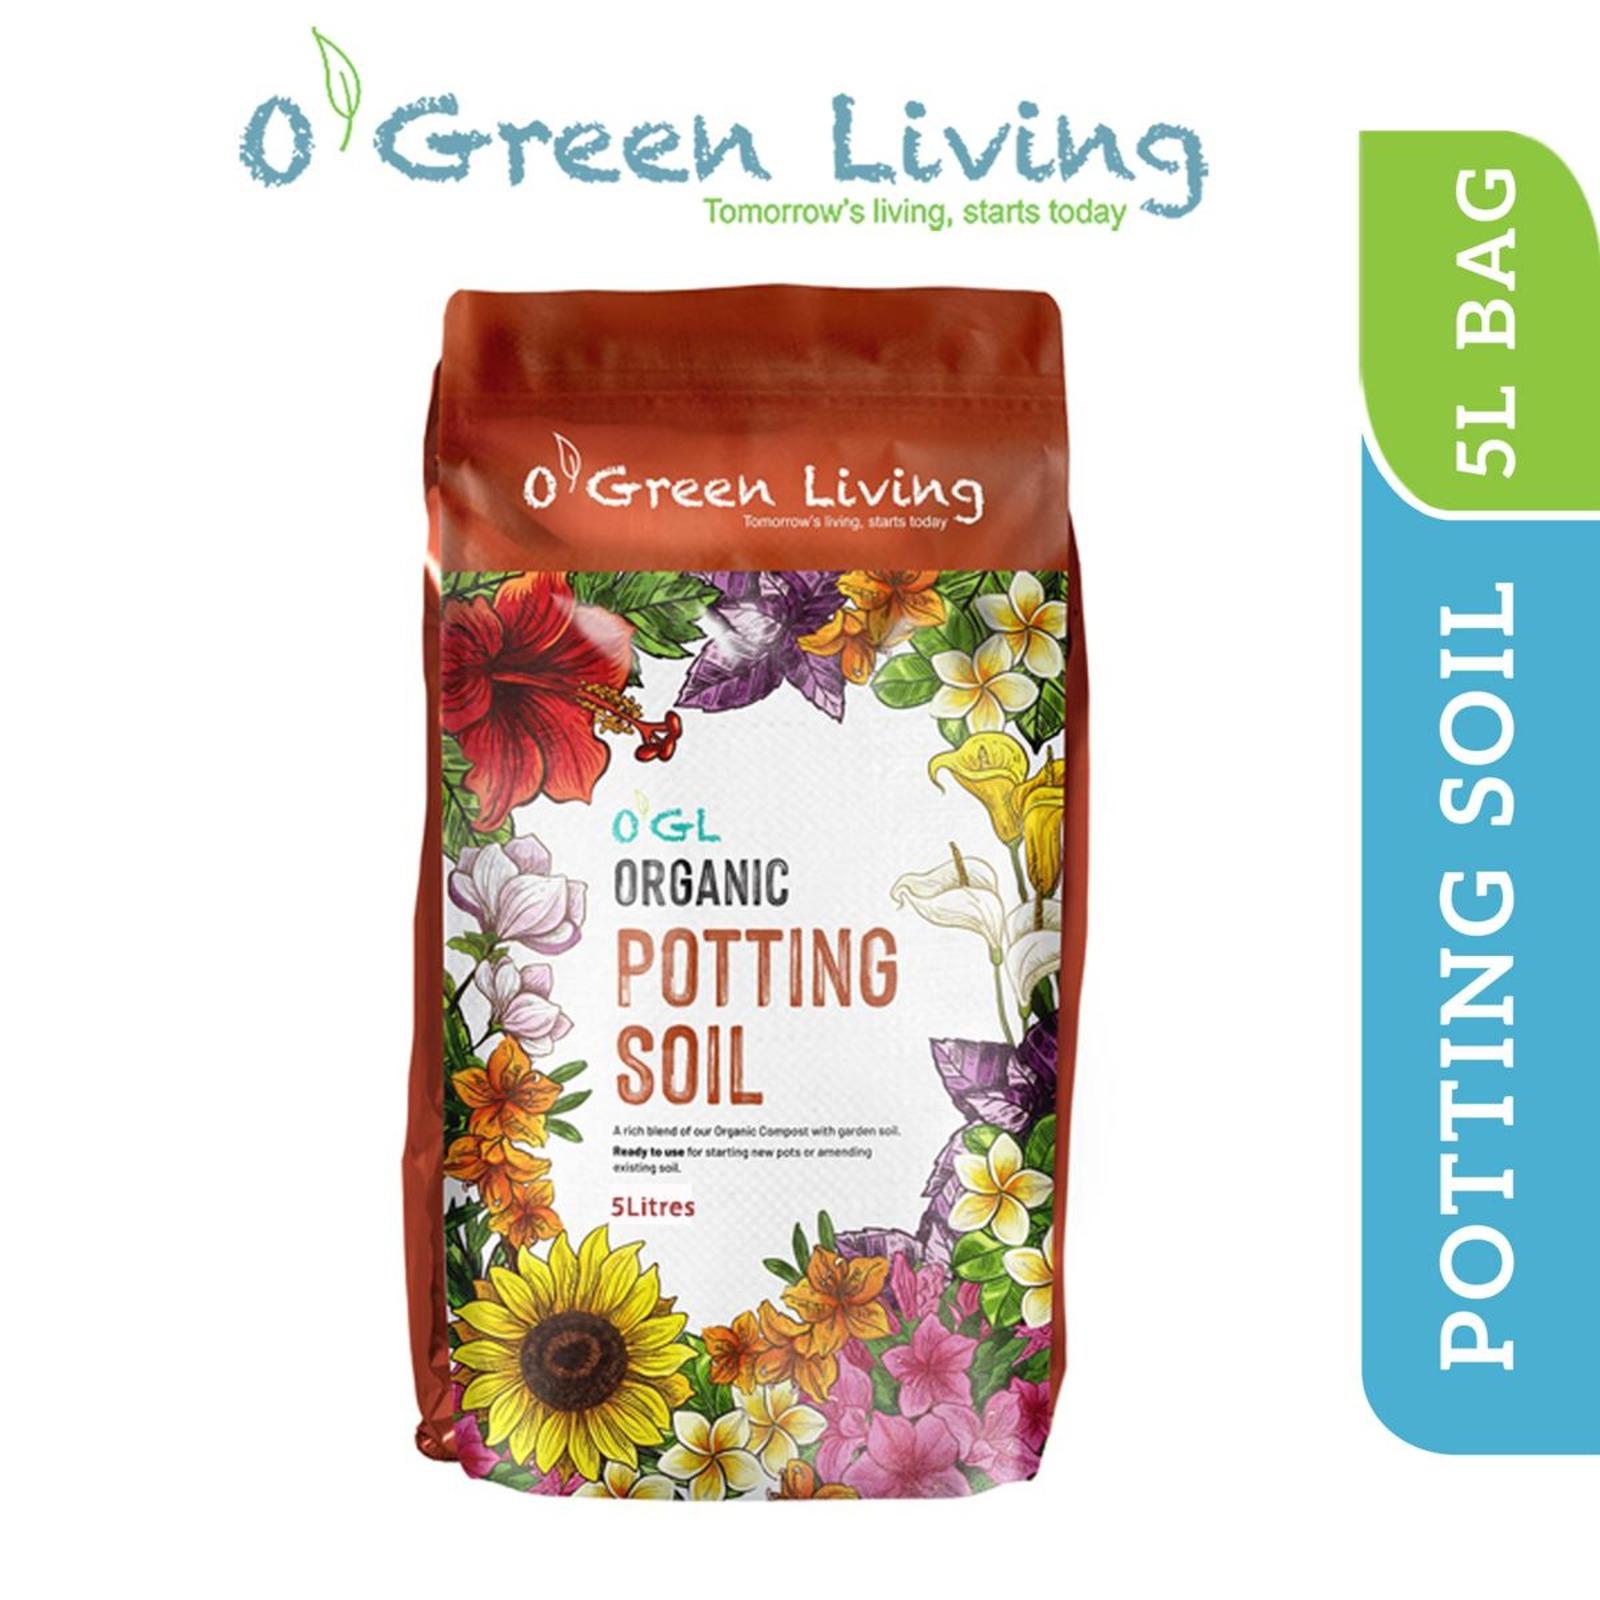 Organic Green Living (OGL) Potting soil